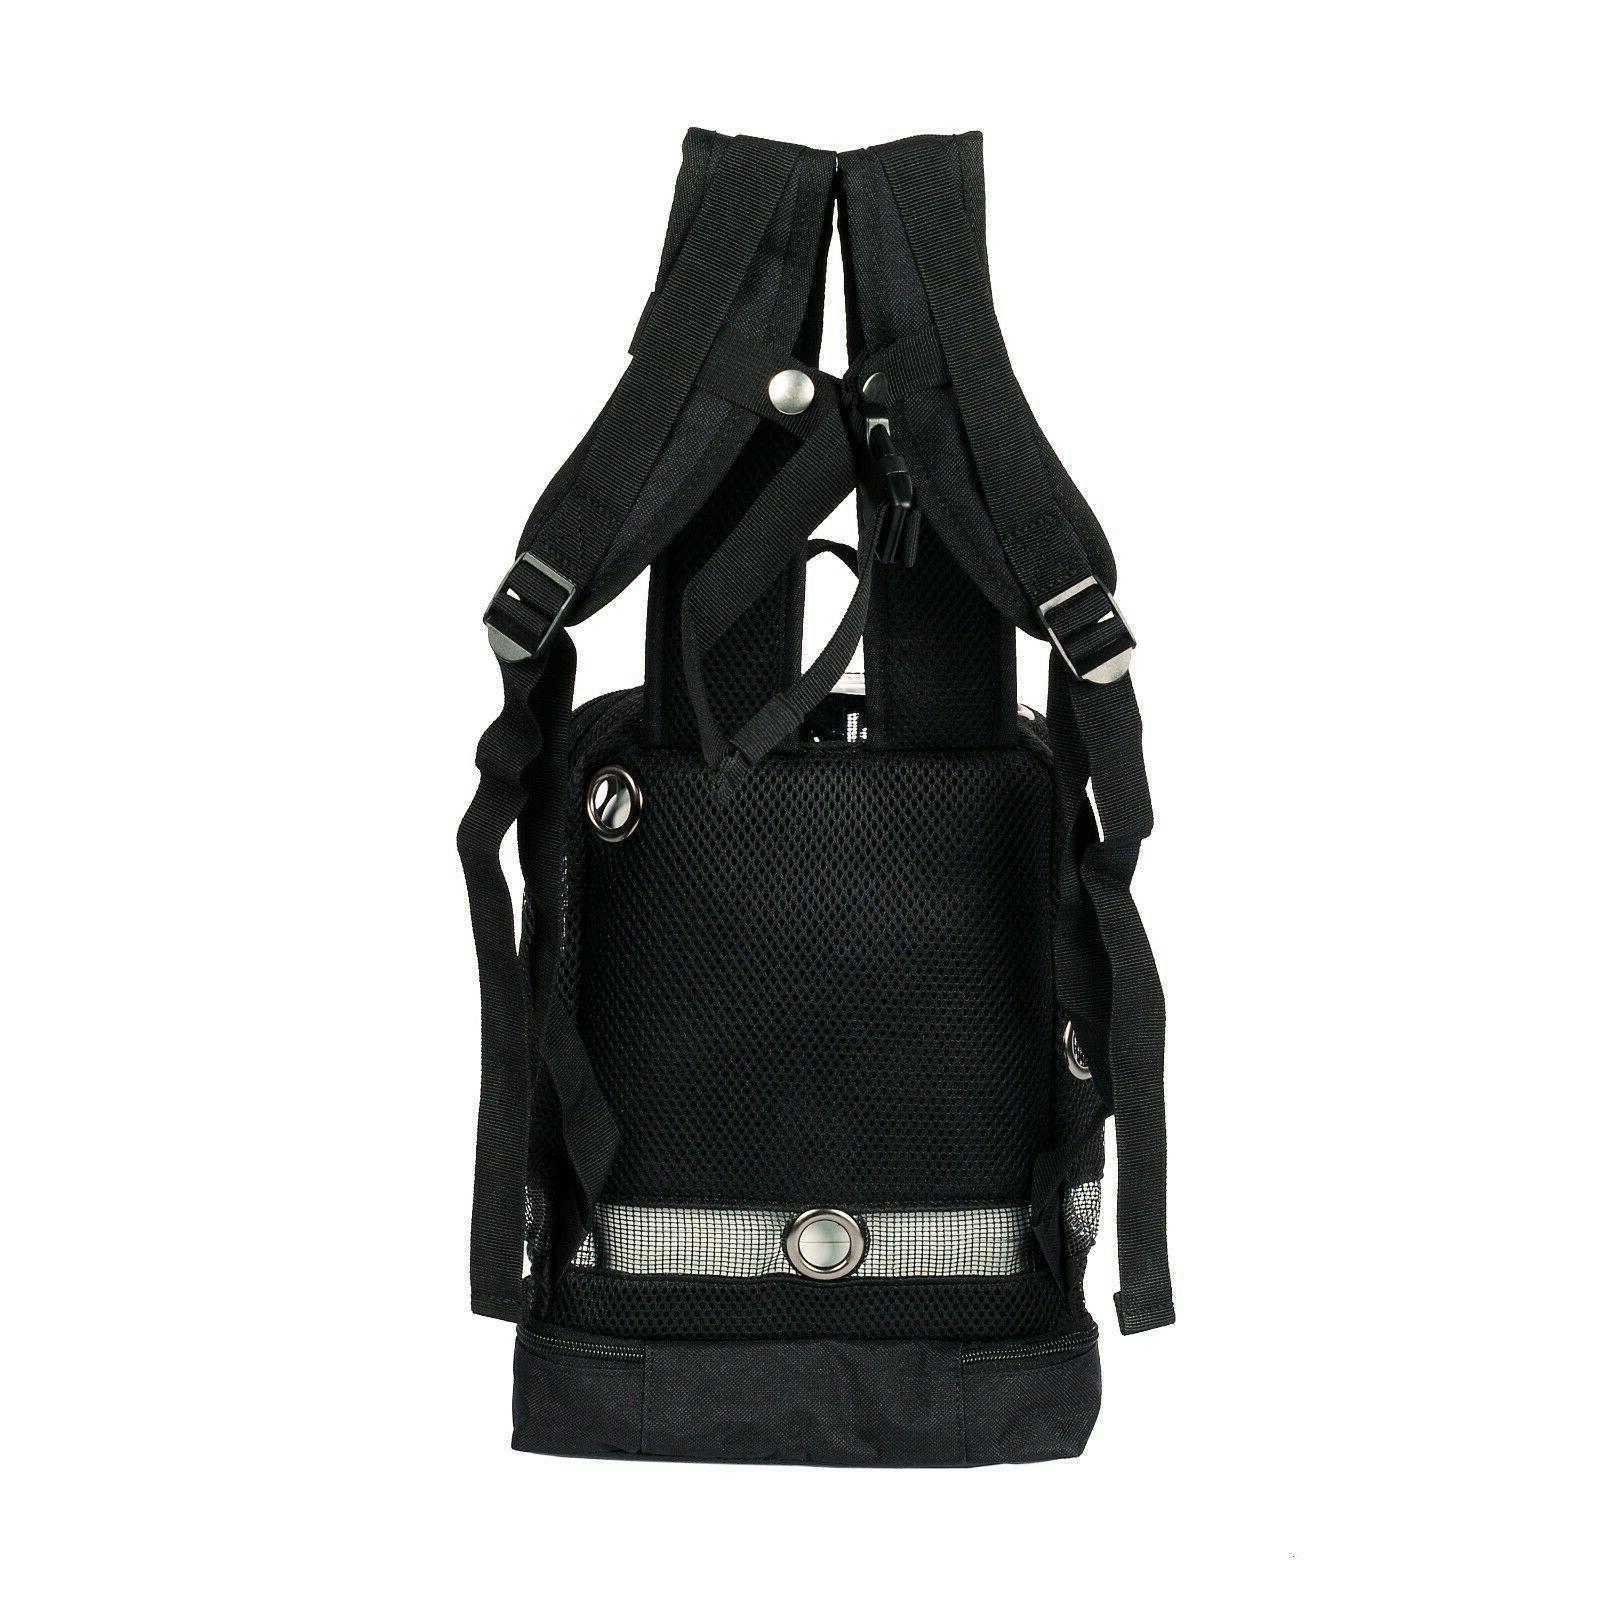 Mesh Backpack Oxygen Concentrator/Inogen one G3,